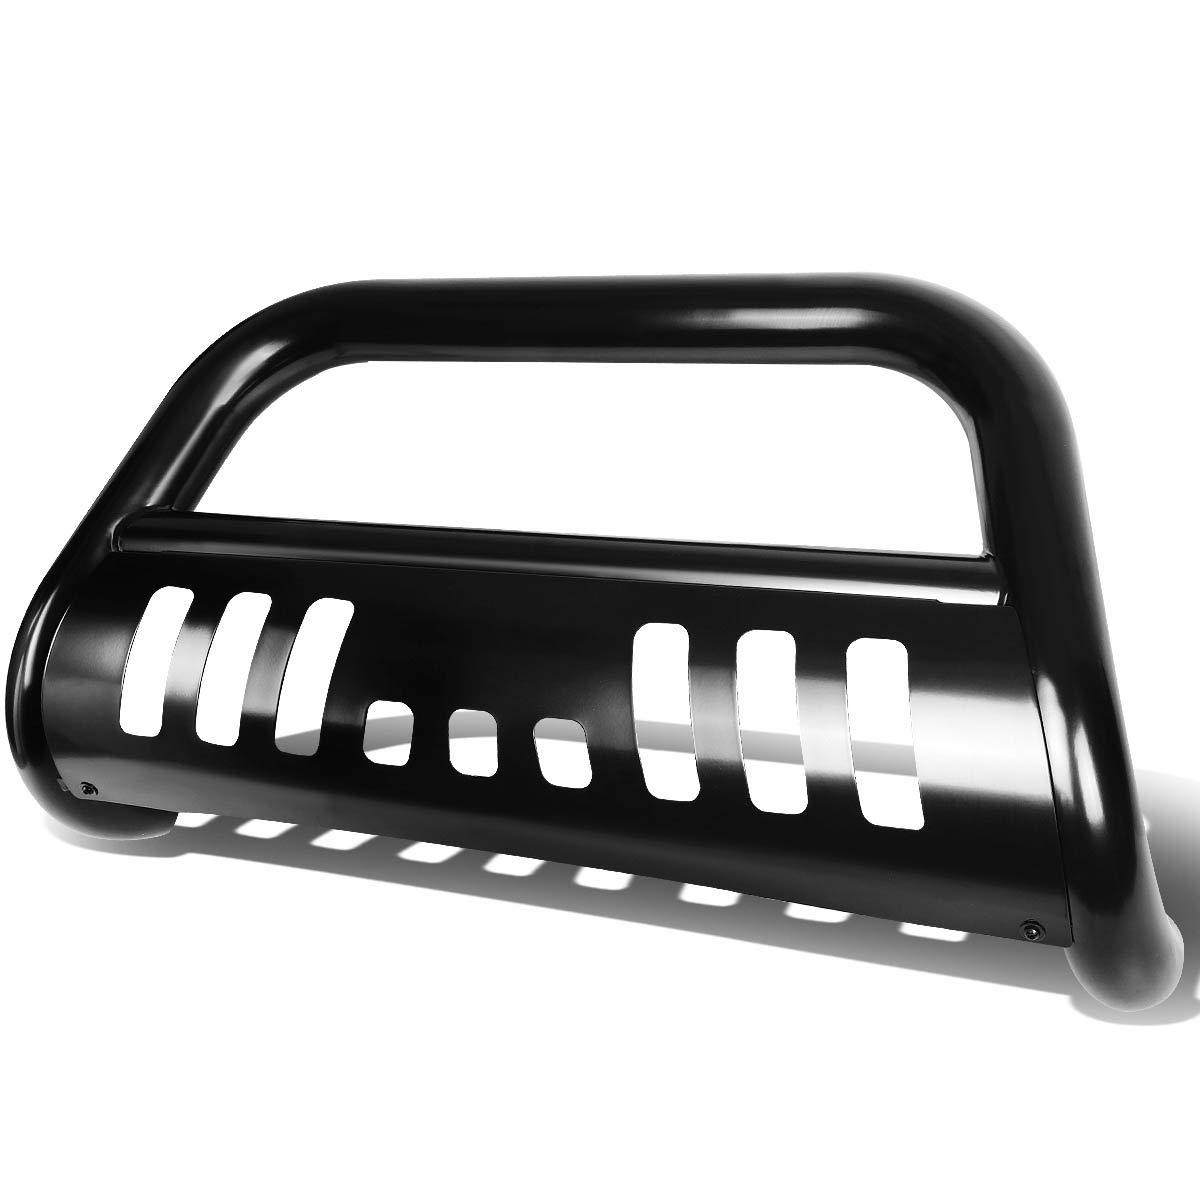 For Nissan Pathfinder R52 3'' Bumper Push Bull Bar+Removable Skid Plate (Black)